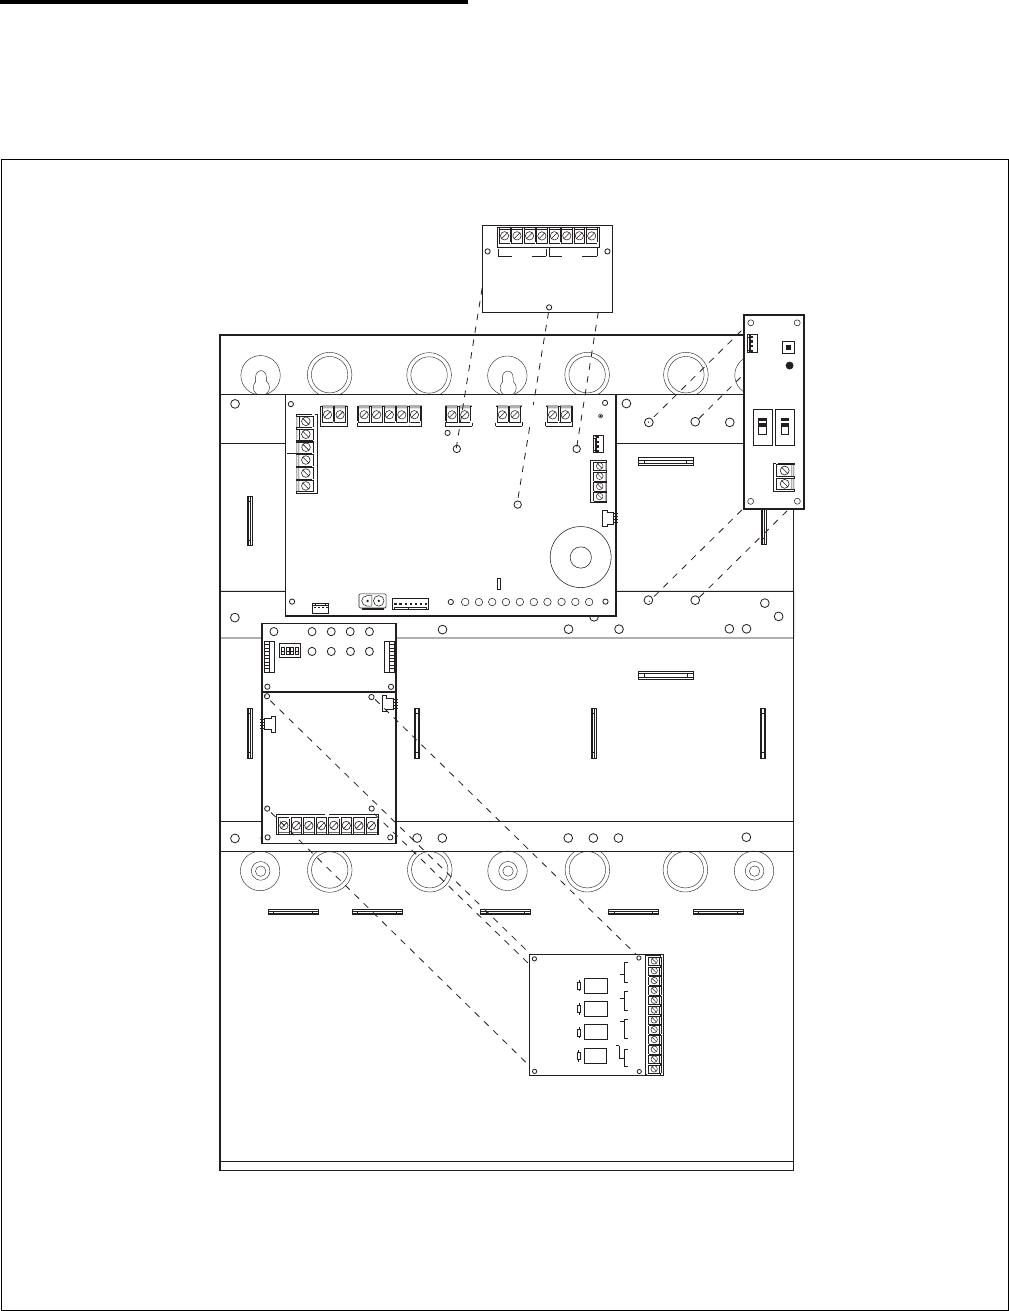 Esl2500 Manual 2711e Esl 2501 Fire Alarm Control Panel Install 120vac To 12vdc Power Supply Schematic Furthermore Digital Clock 30